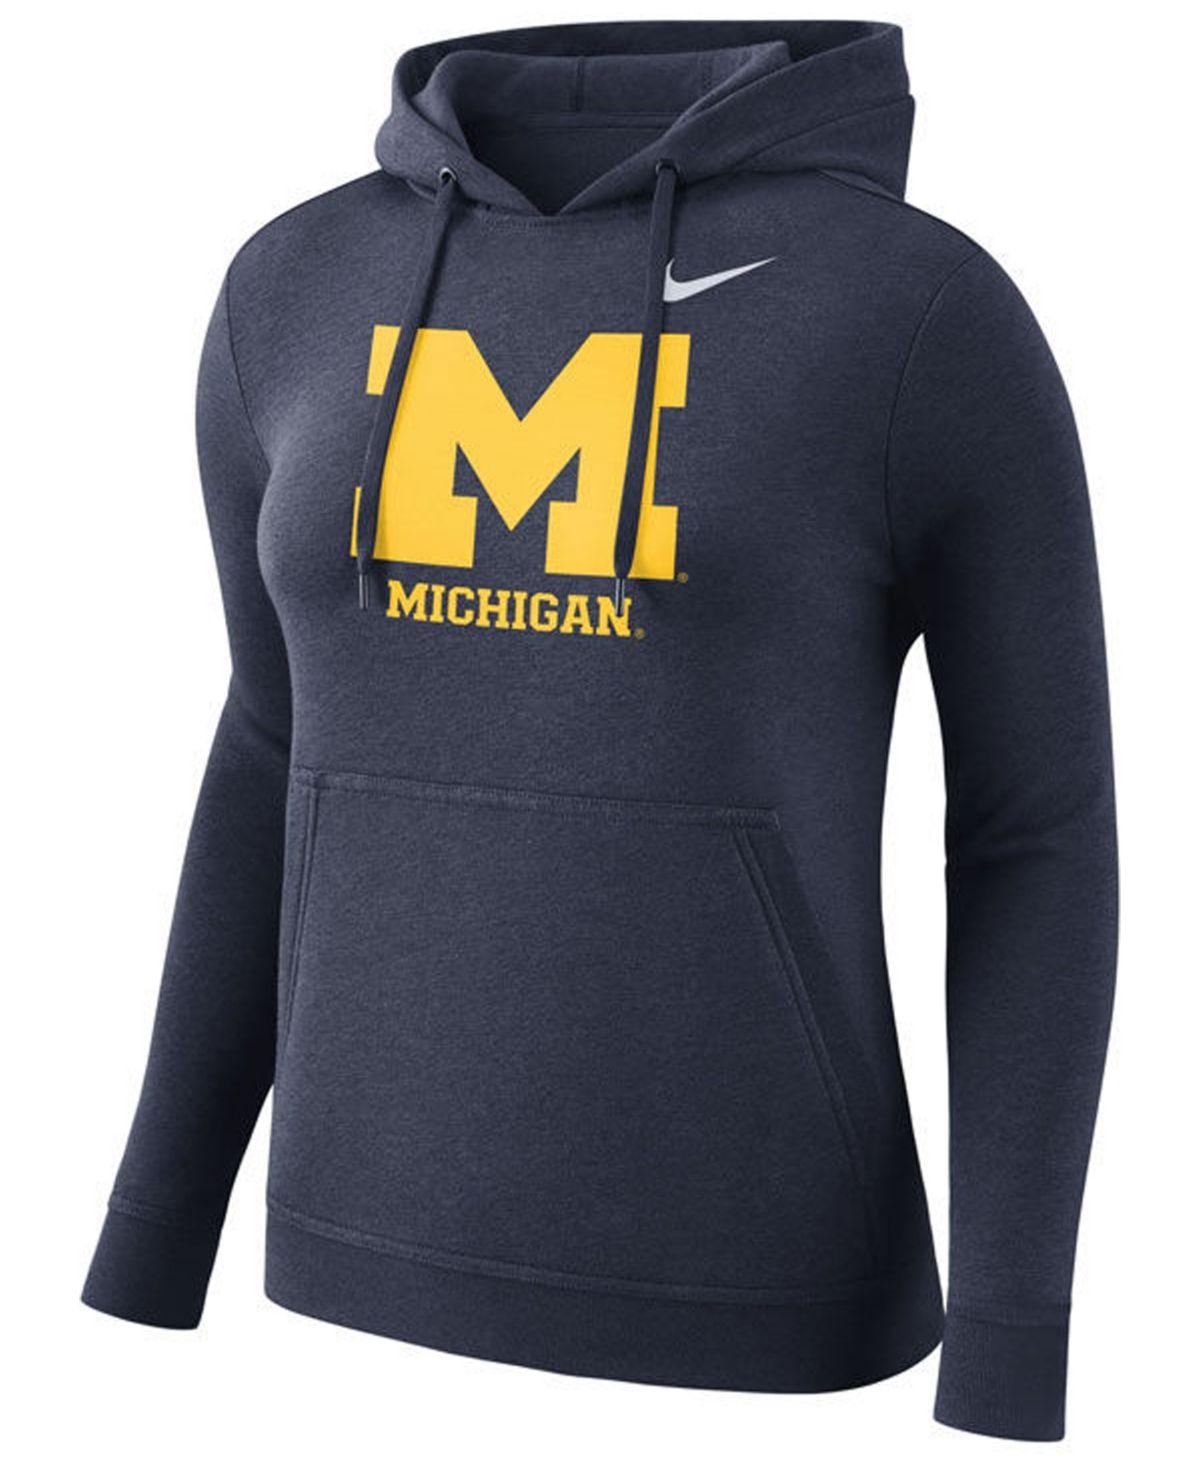 Nike Women S Michigan Wolverines Club Hooded Sweatshirt Navy Nike Women Sweatshirts Hooded Sweatshirts [ 1467 x 1200 Pixel ]